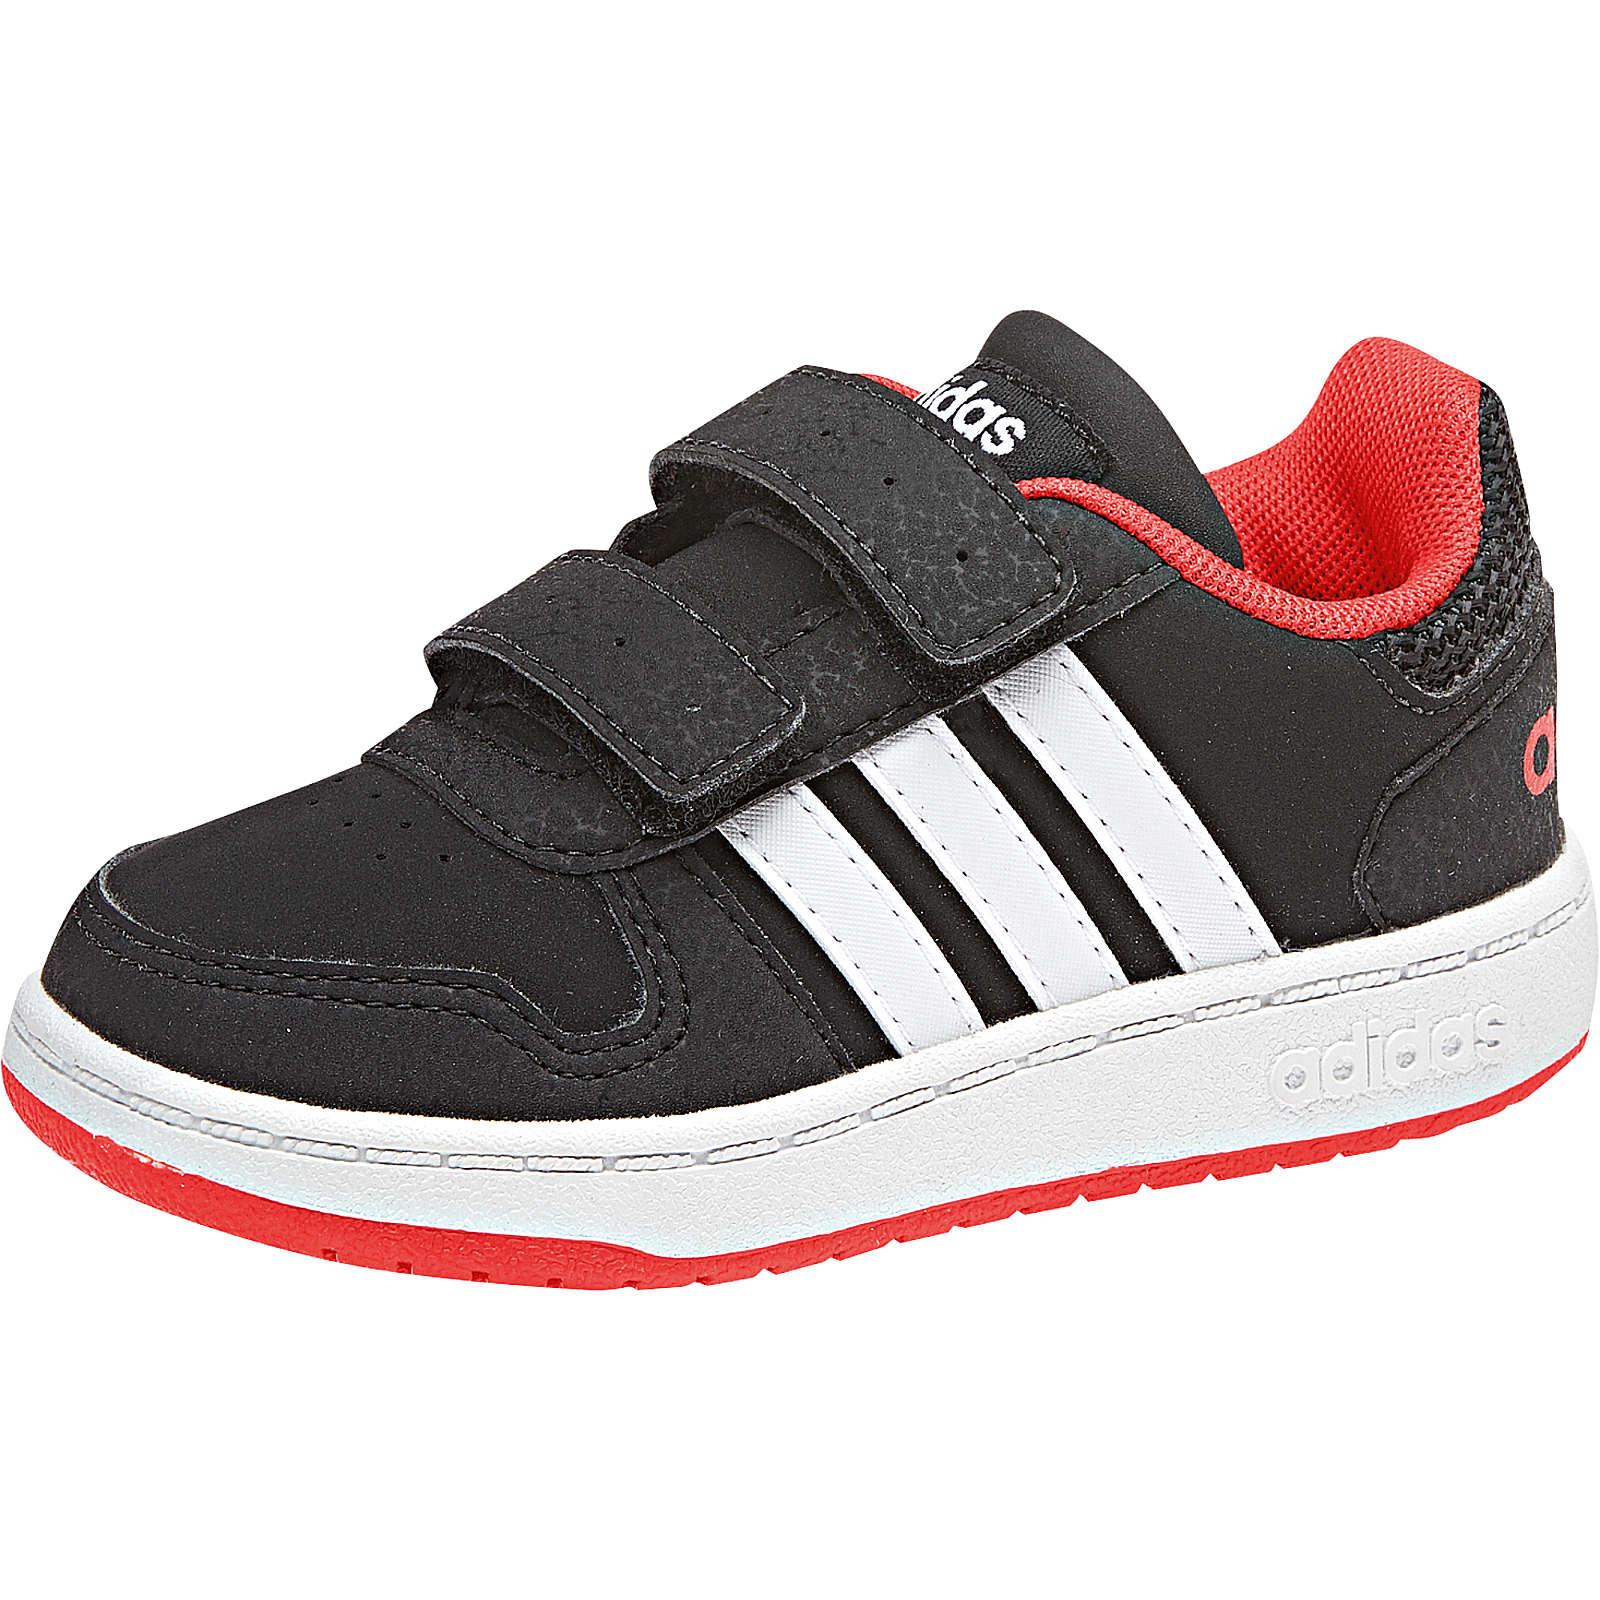 adidas Sport Inspired Baby Sneakers HOOPS 2.0 CMF schwarz Gr. 27